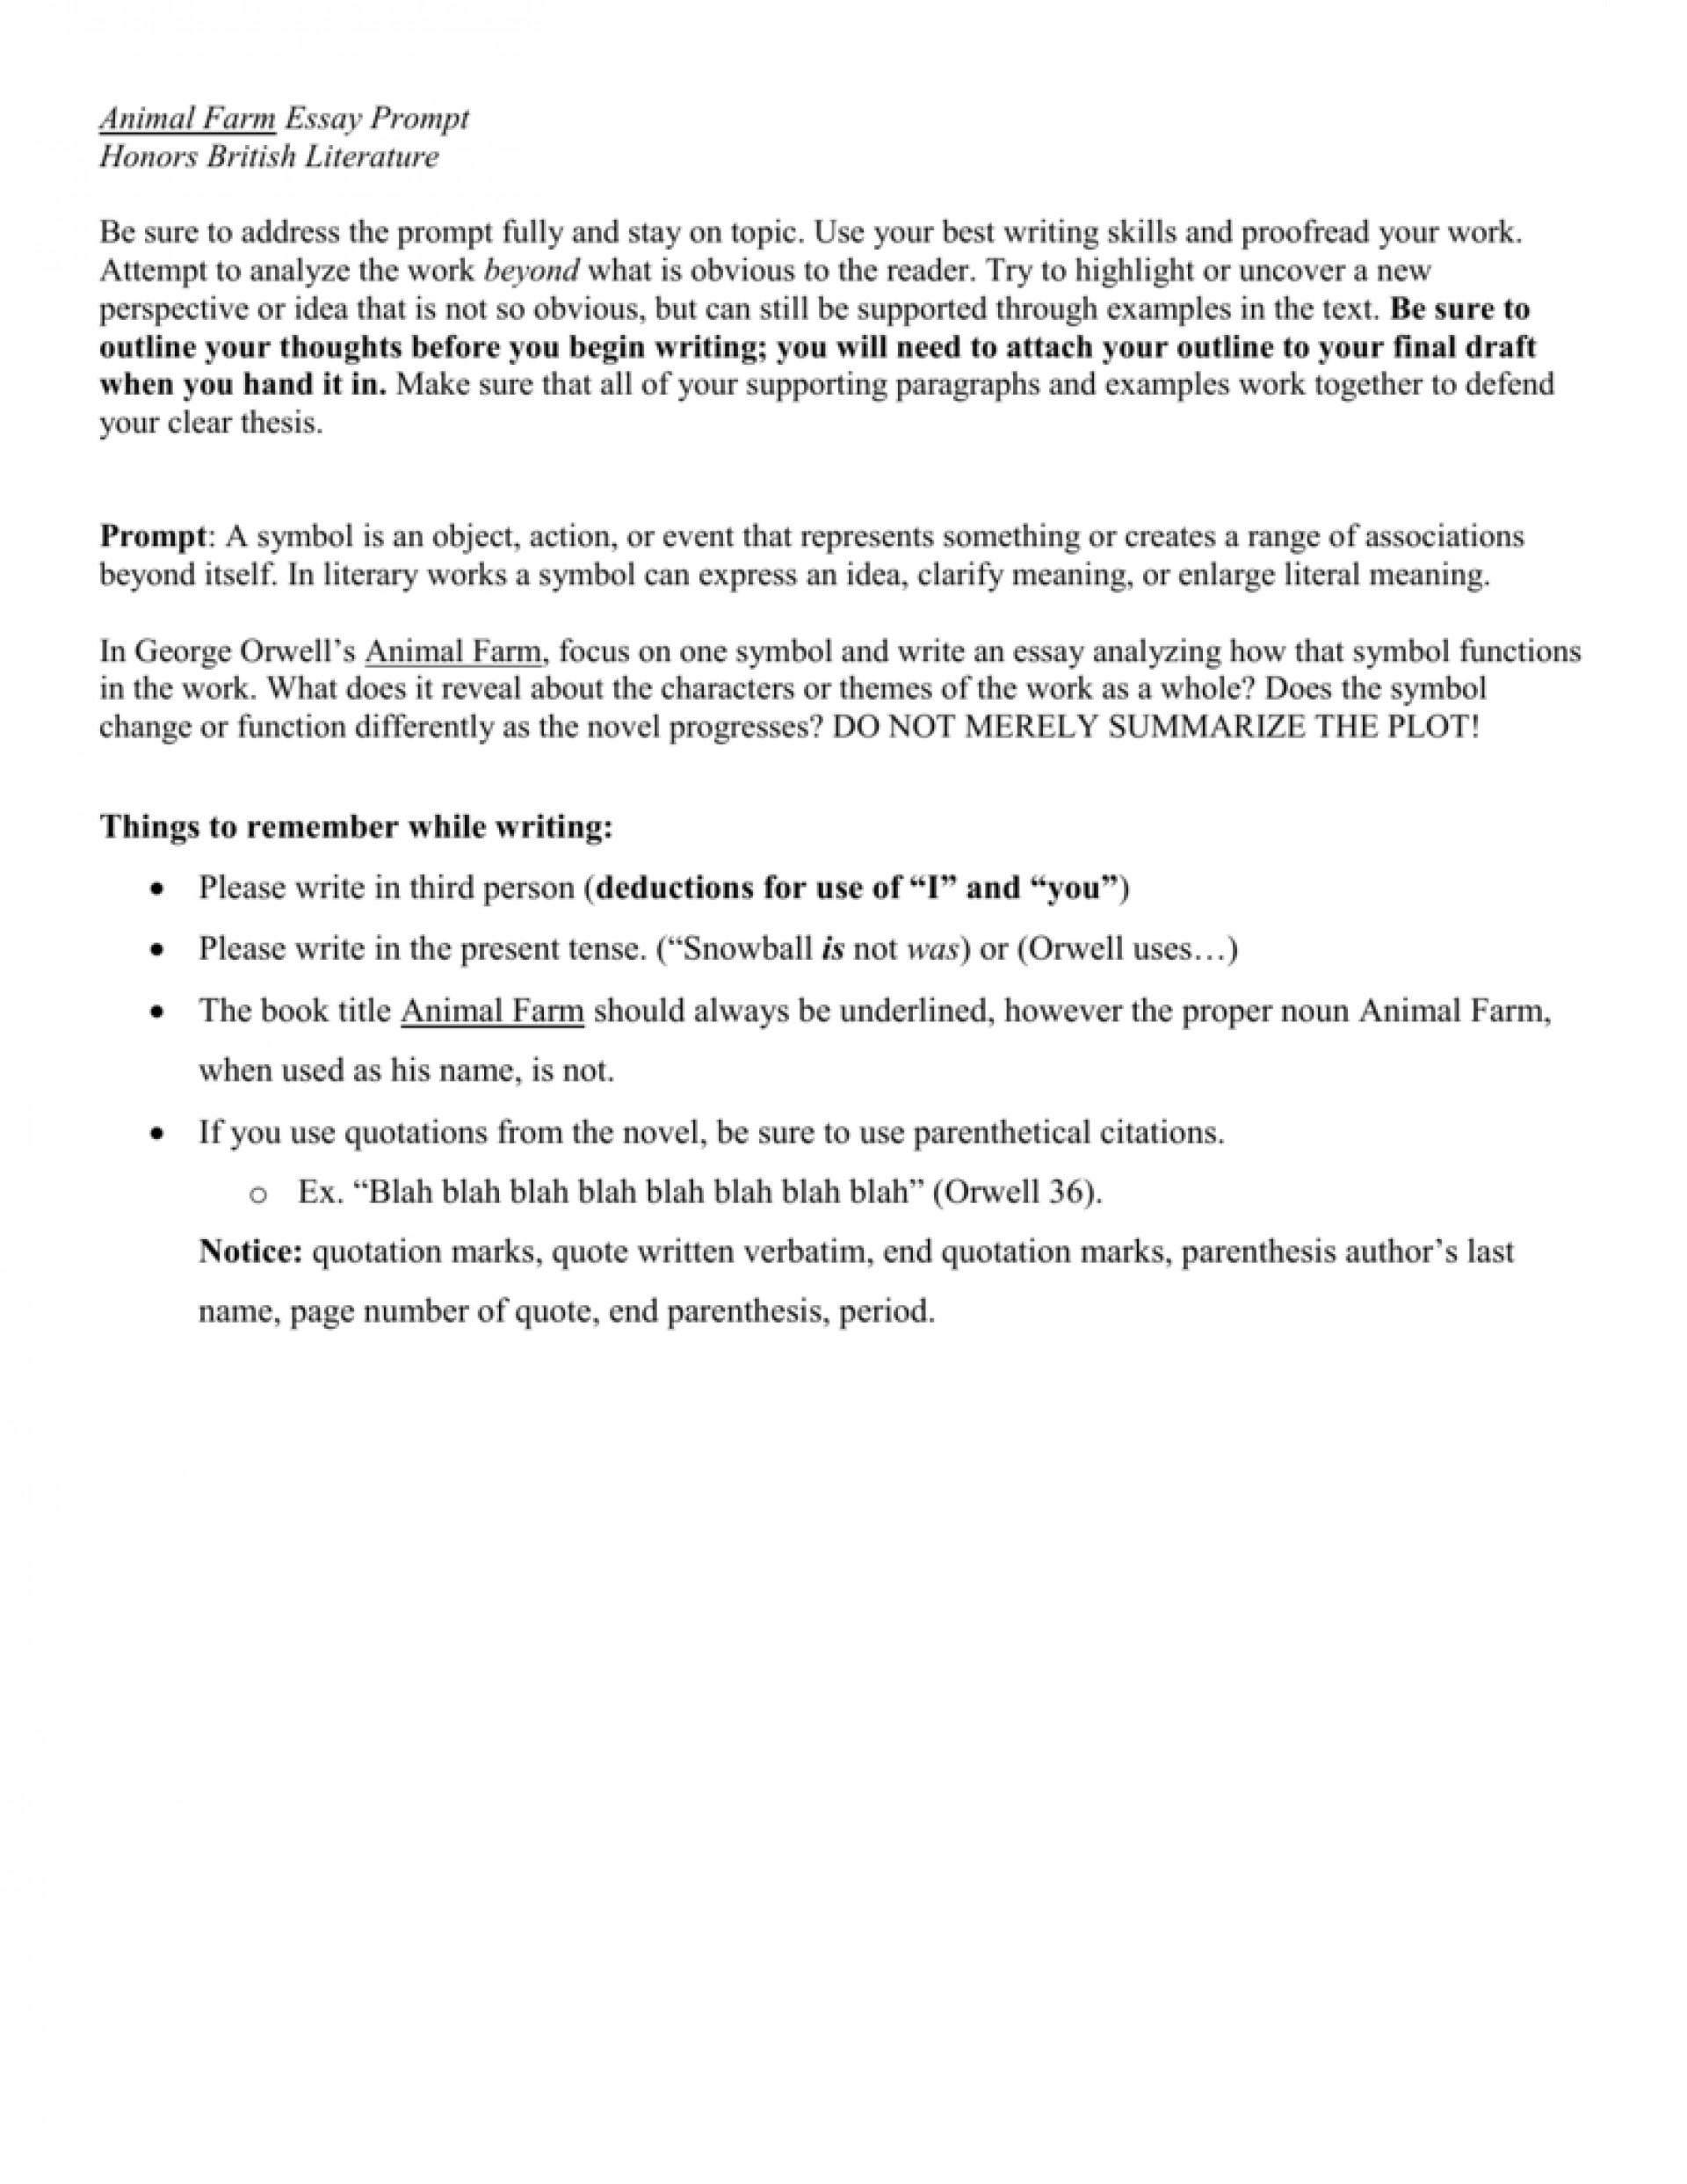 Good essay questions for animal farm